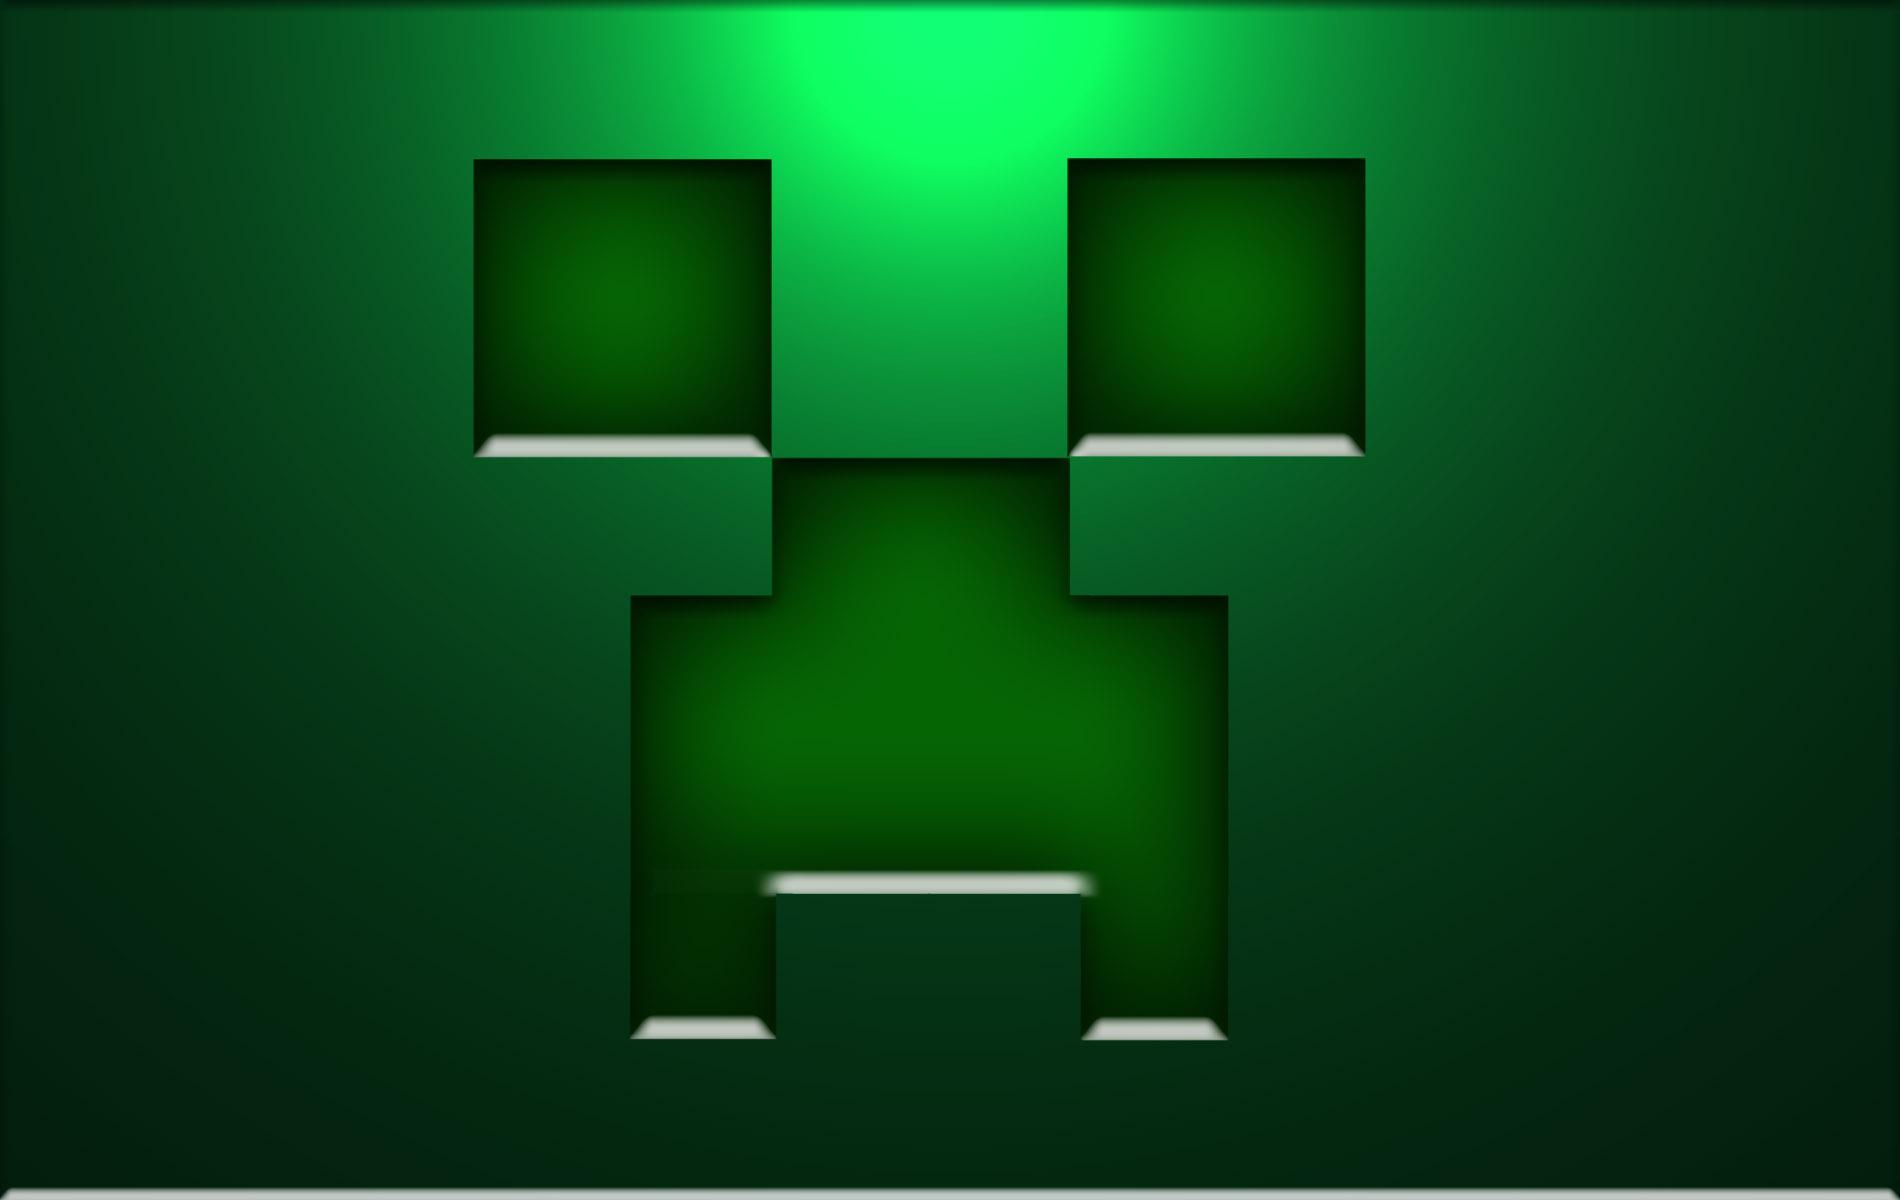 Creeper-Minecraft-Wallpapers-3D-HD-Wallpaper.jpg